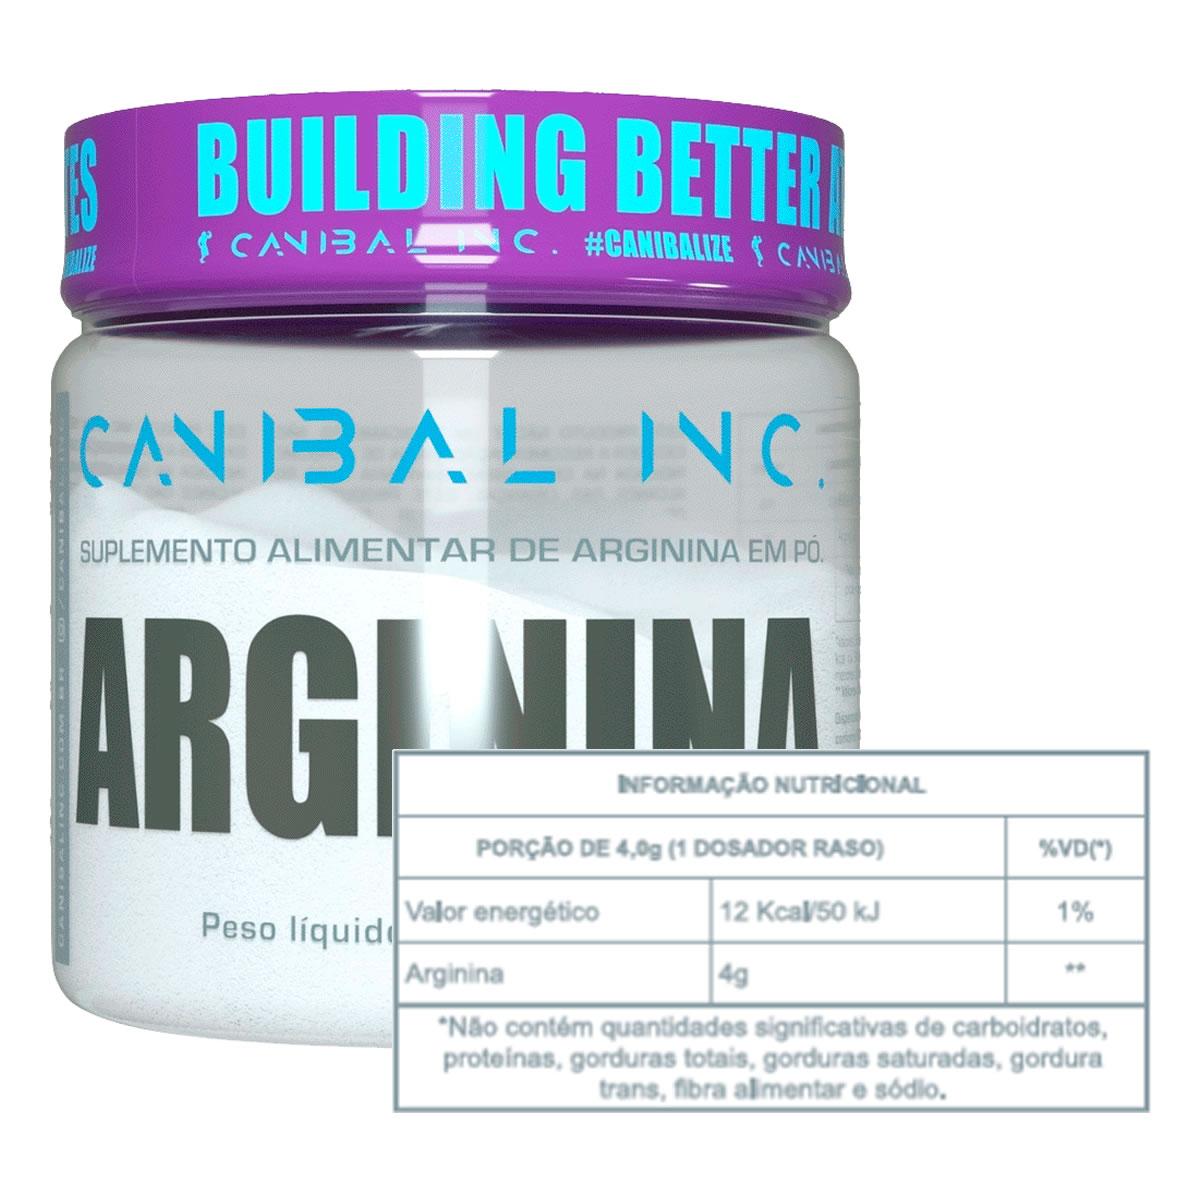 Arginina 200g - CANIBAL INC